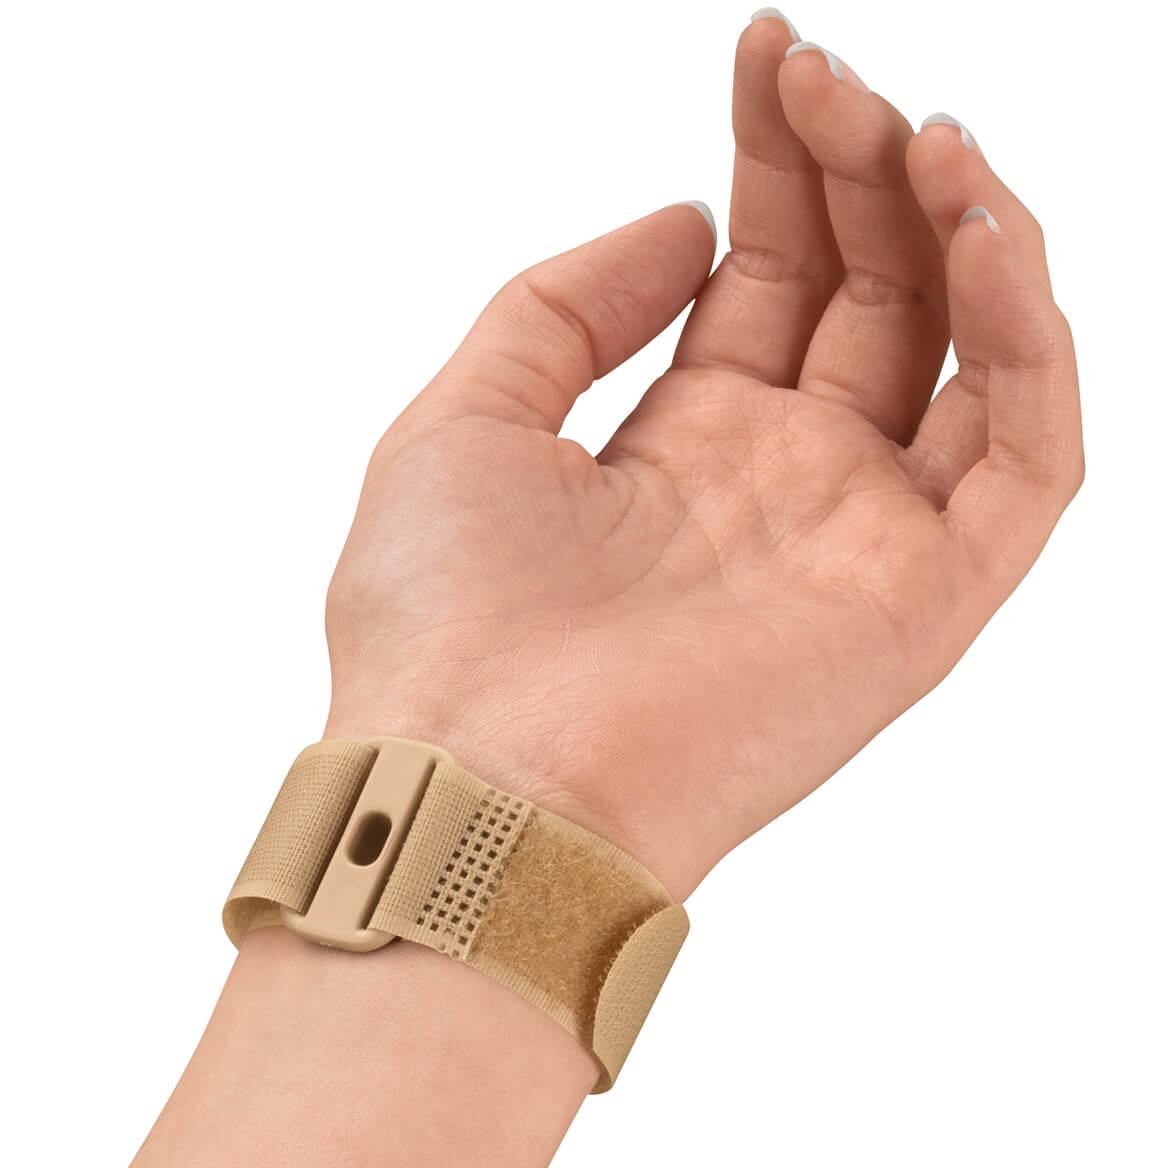 Acupressure Wrist Band - Insomnia Bracelet - Walter Drake